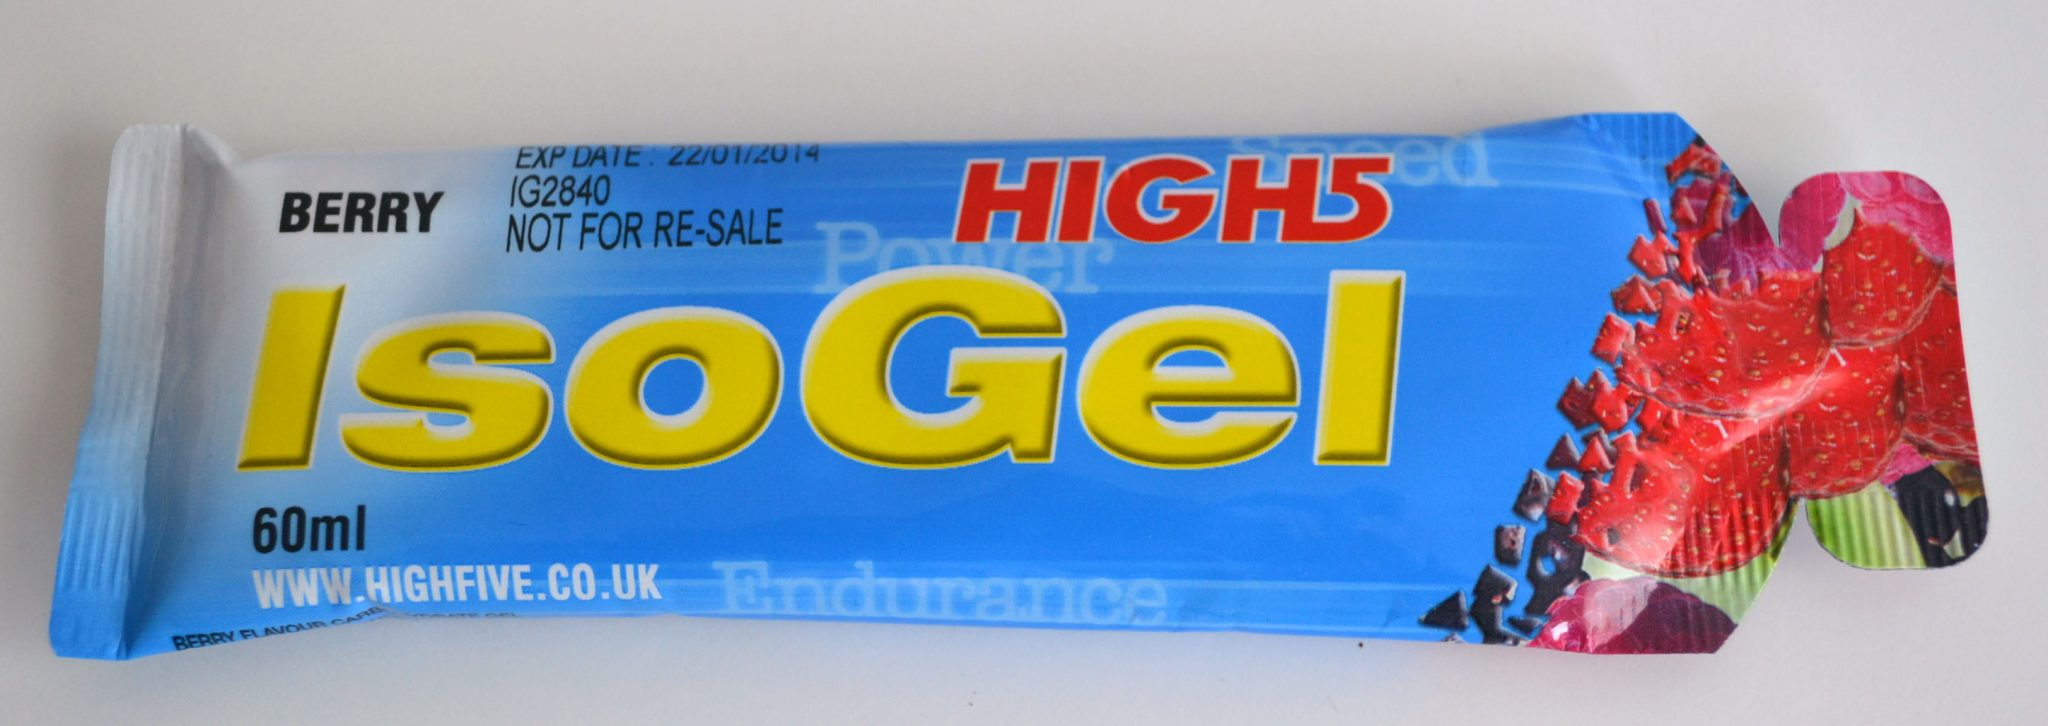 High 5 Iso Gel